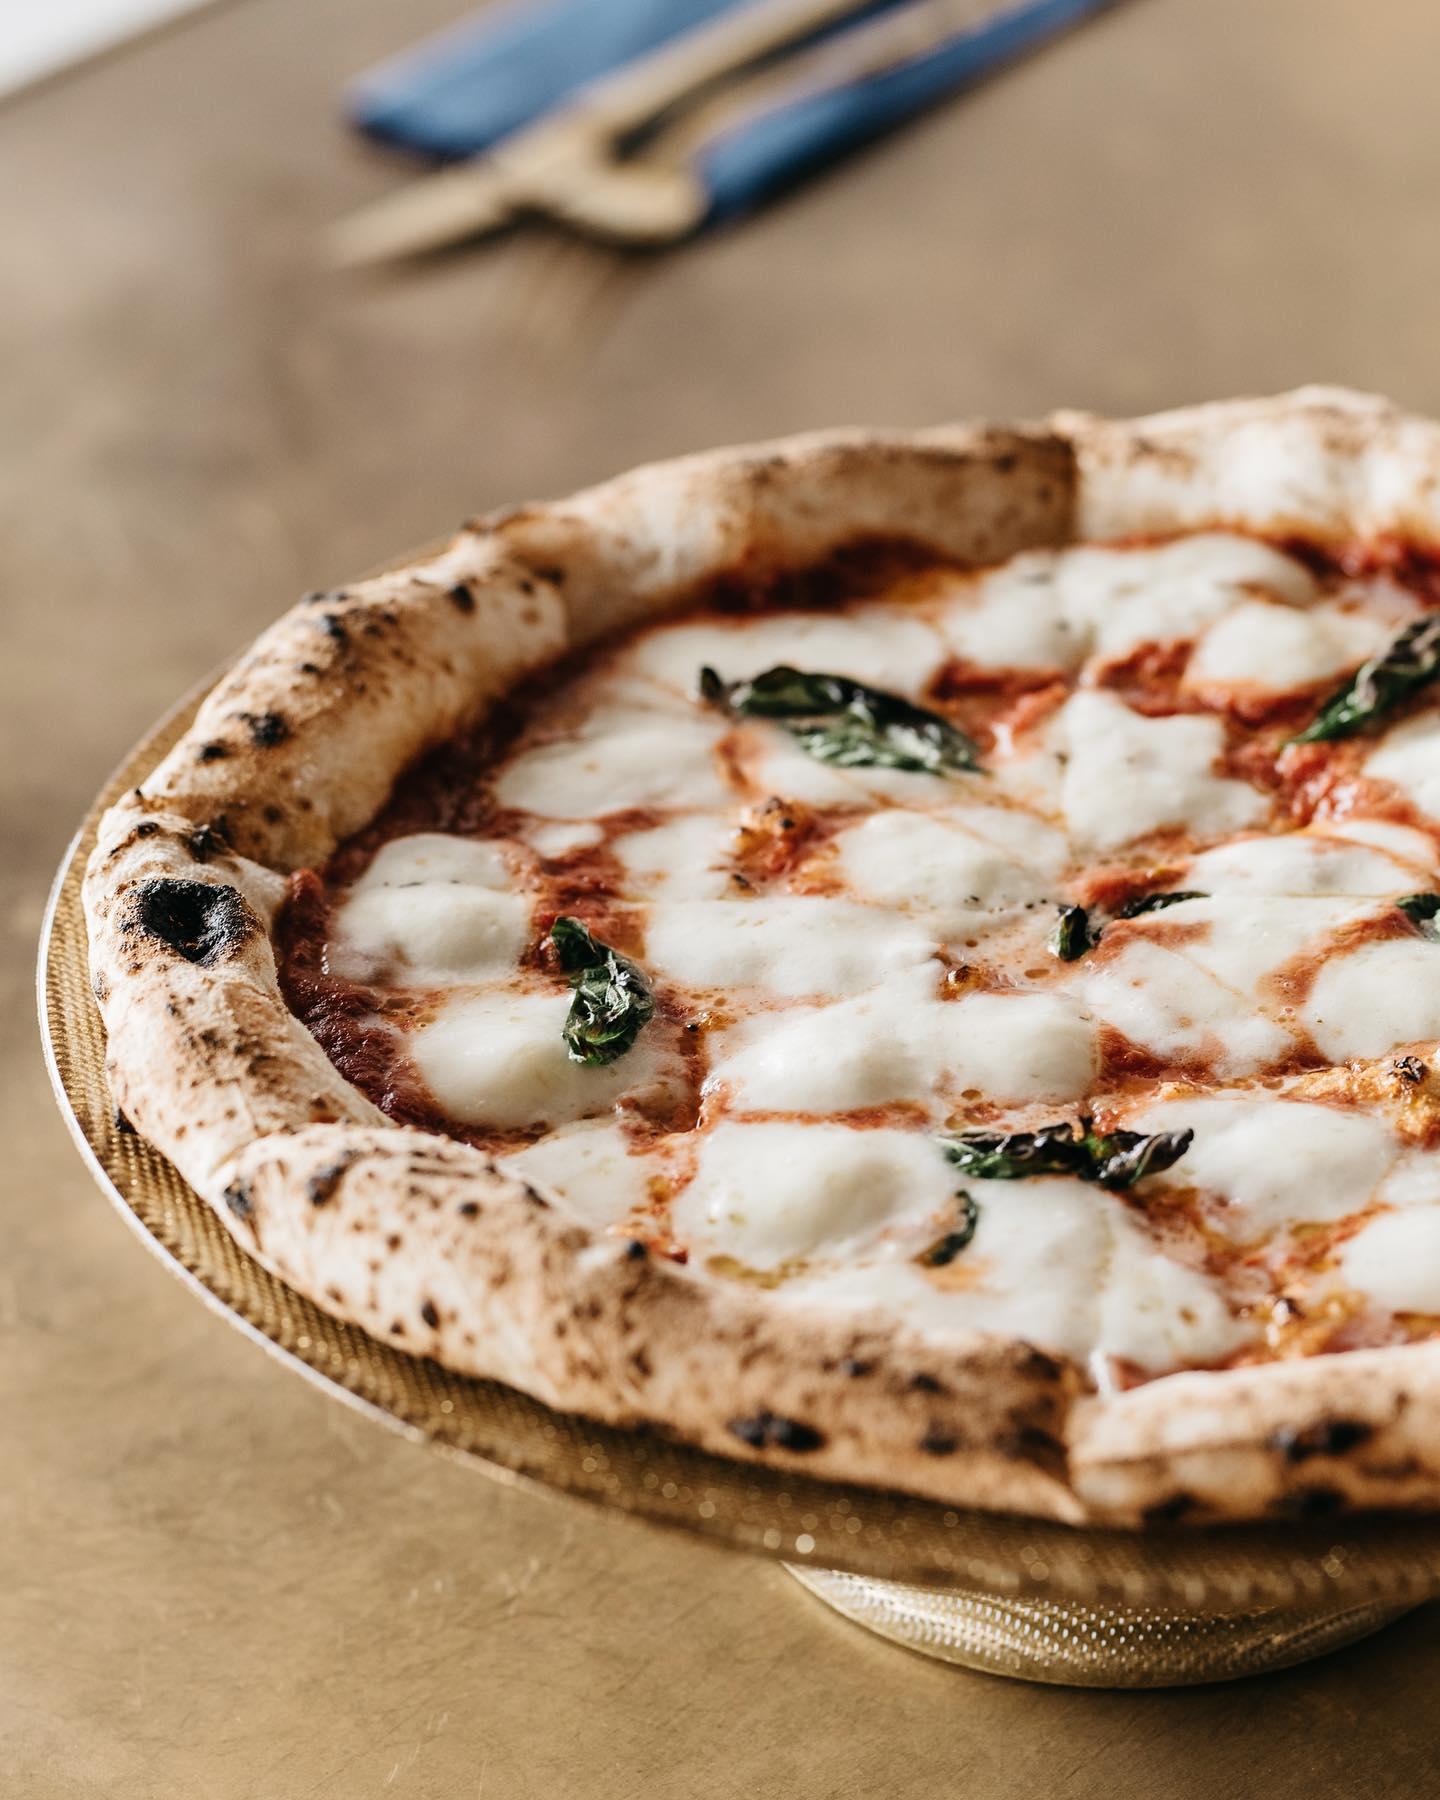 Pizzeria in Split makes list of Europe's best